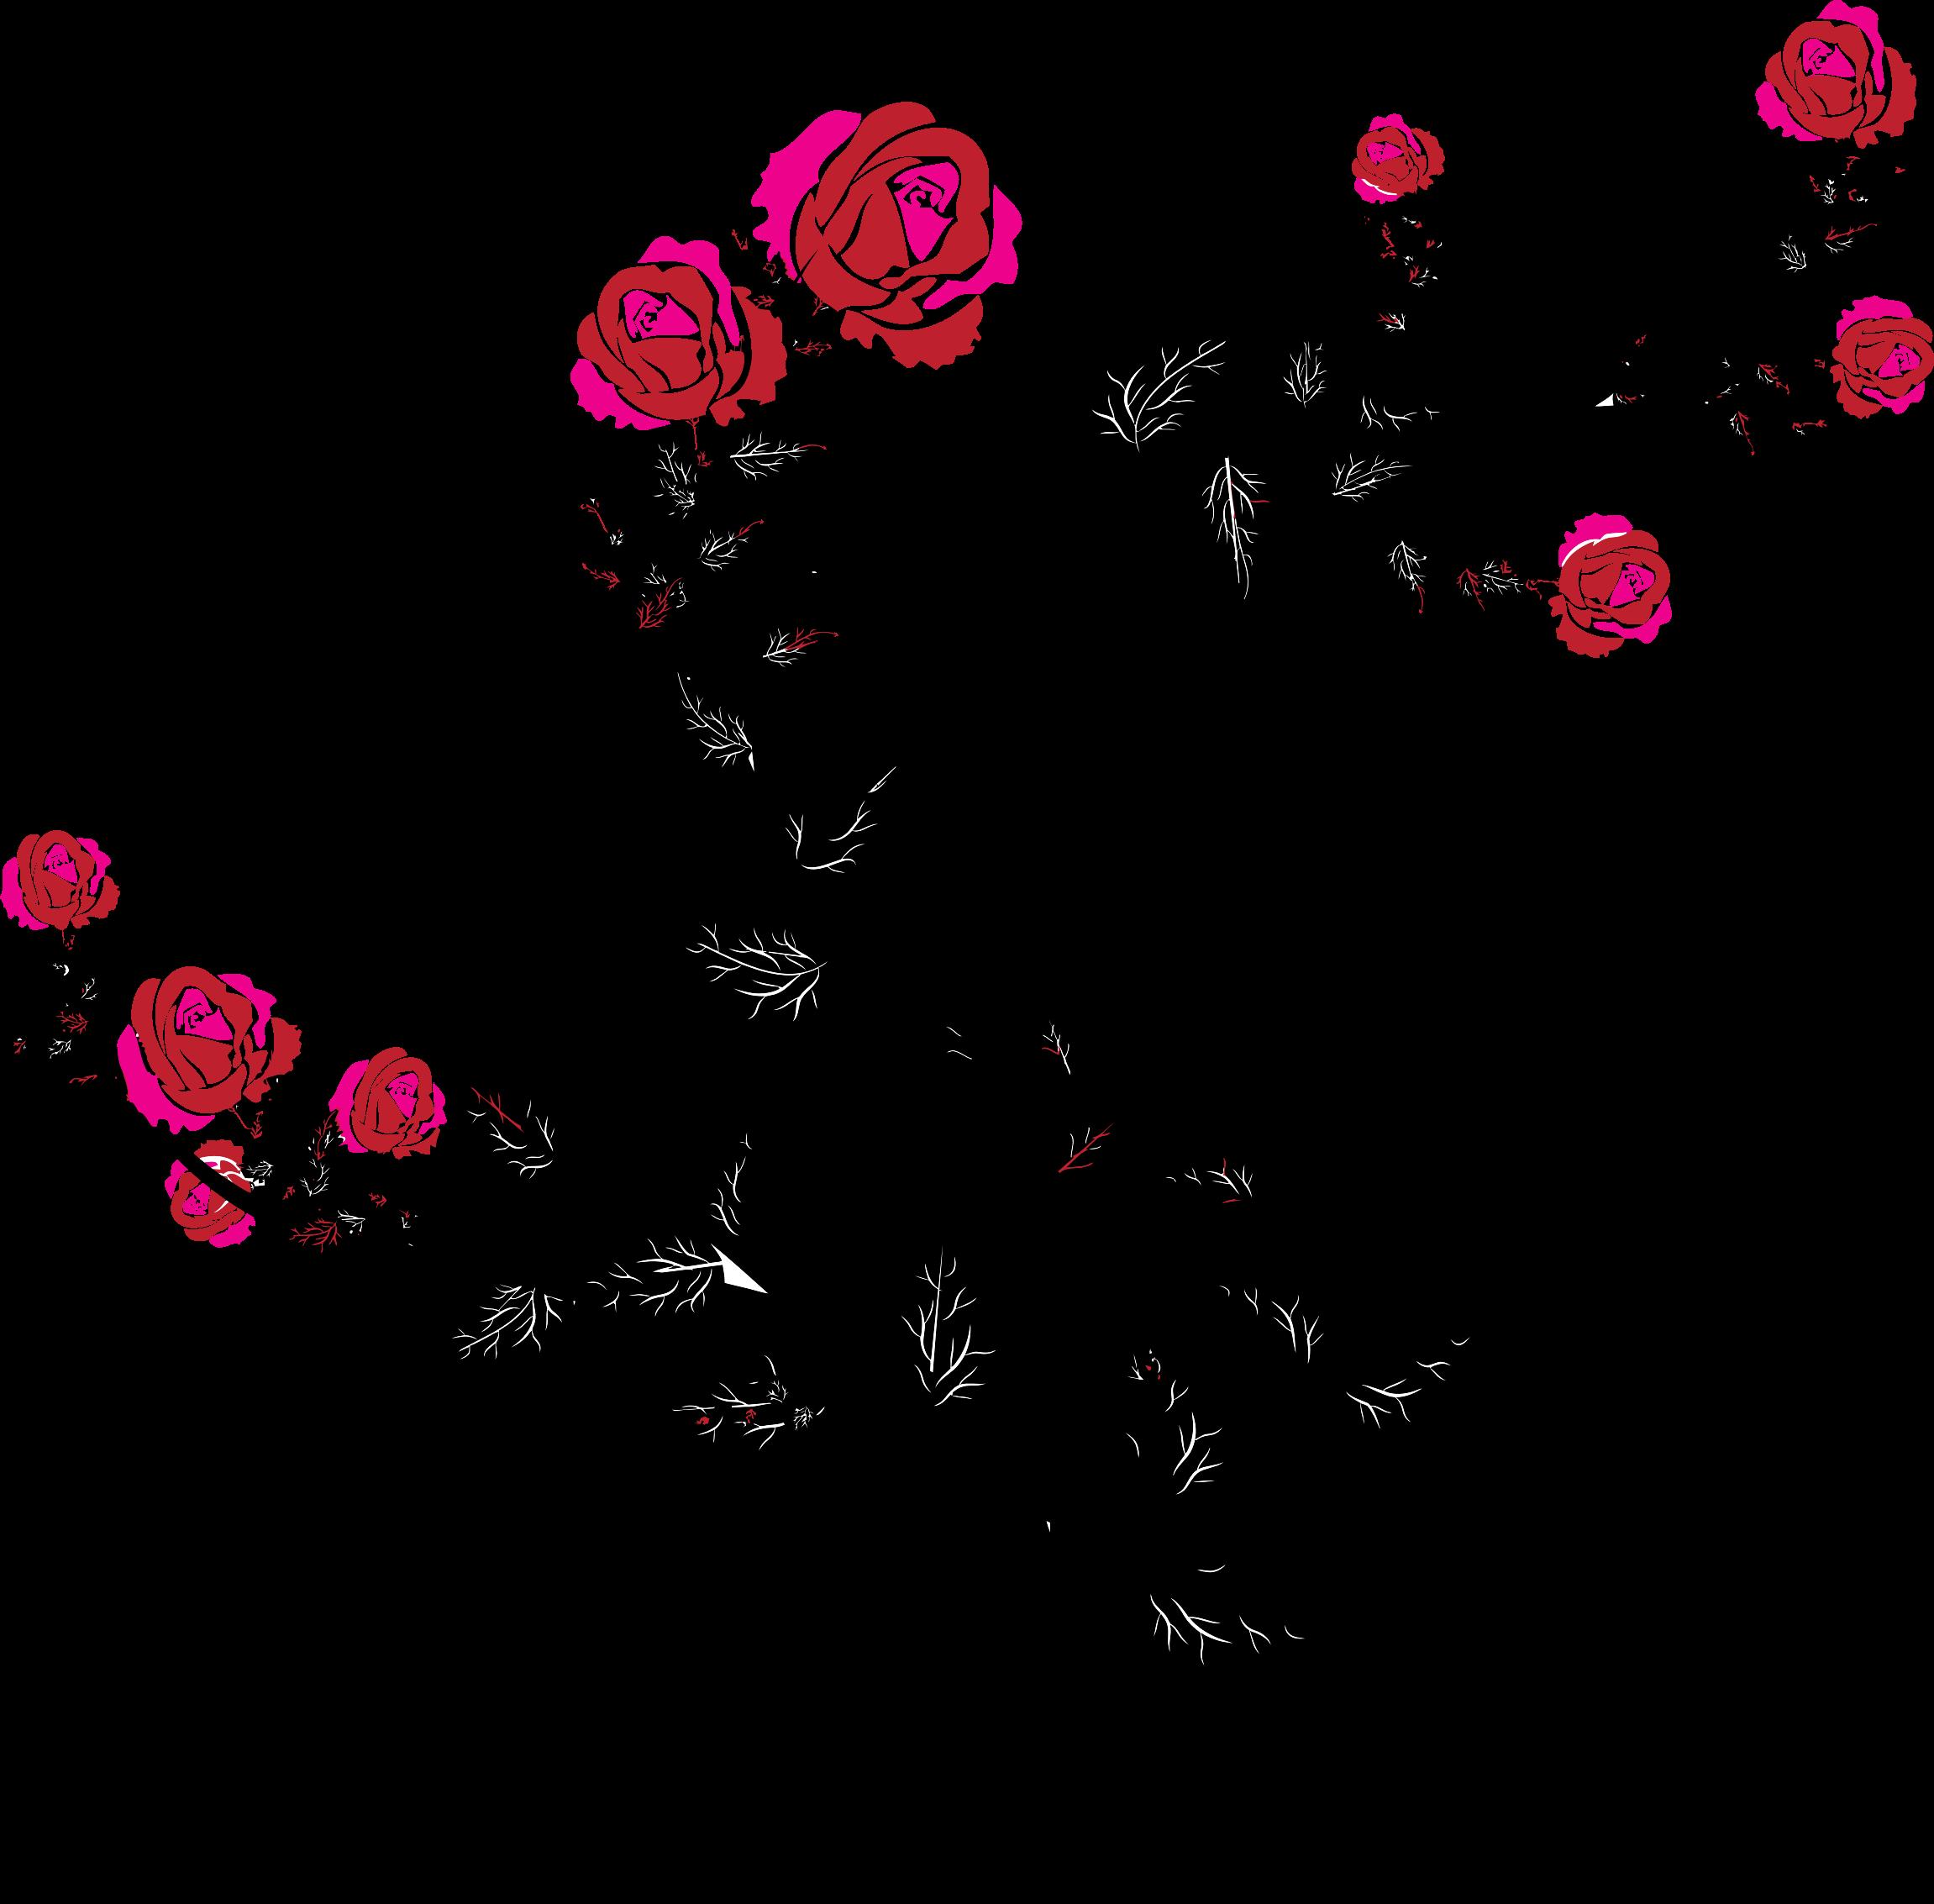 Vines clipart rose, Vines rose Transparent FREE for ...